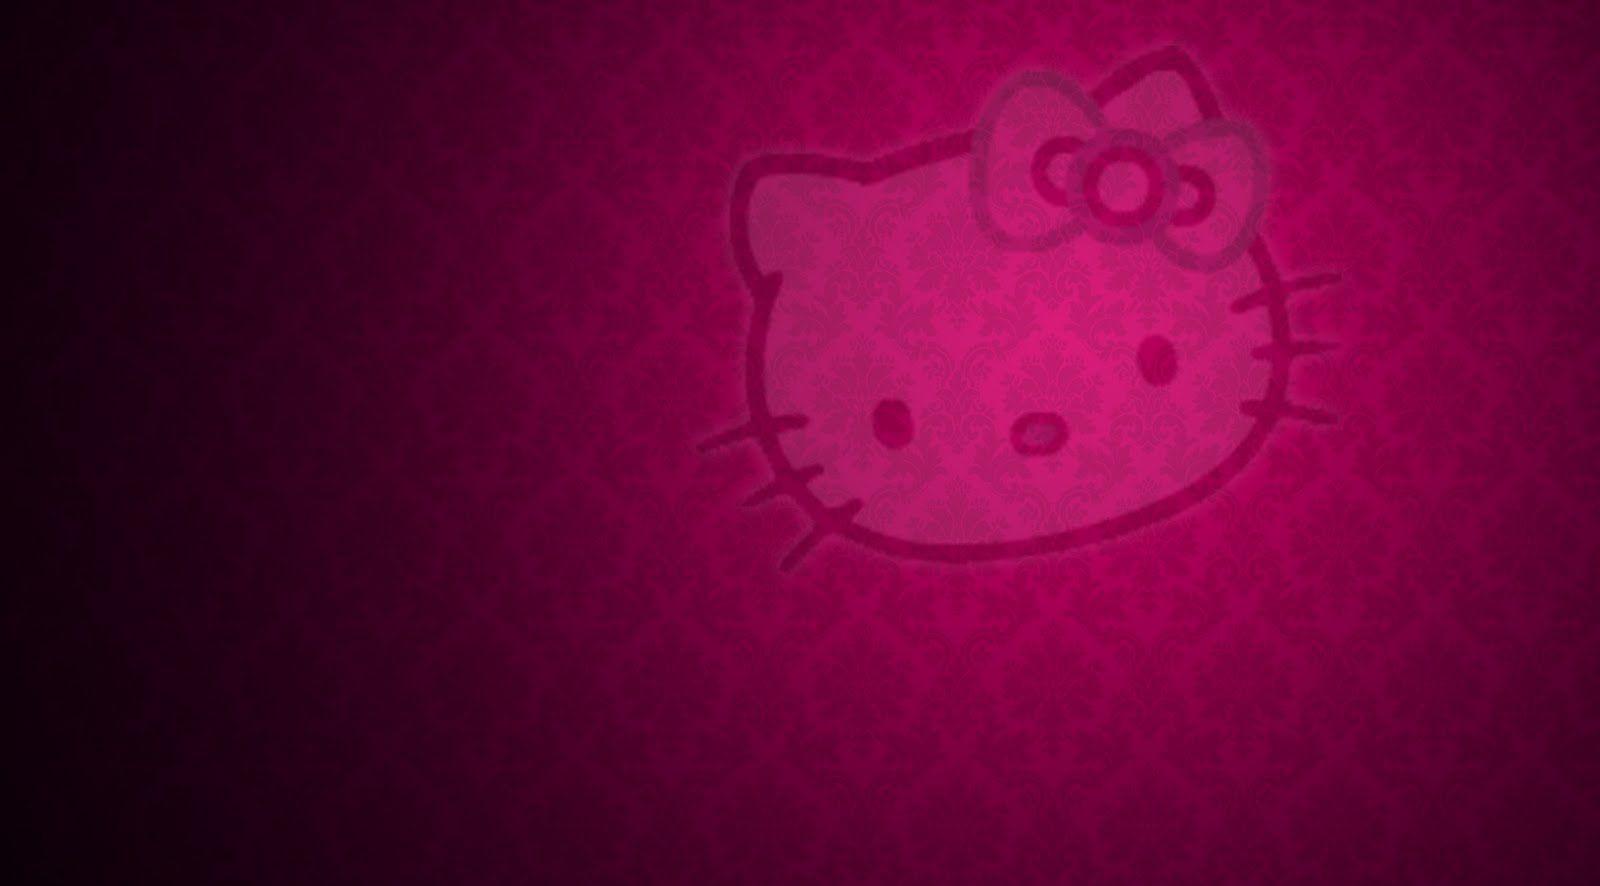 Good Wallpaper Hello Kitty Pink - Hello-Kitty-Wallpaper-027  Perfect Image Reference_808724.jpg